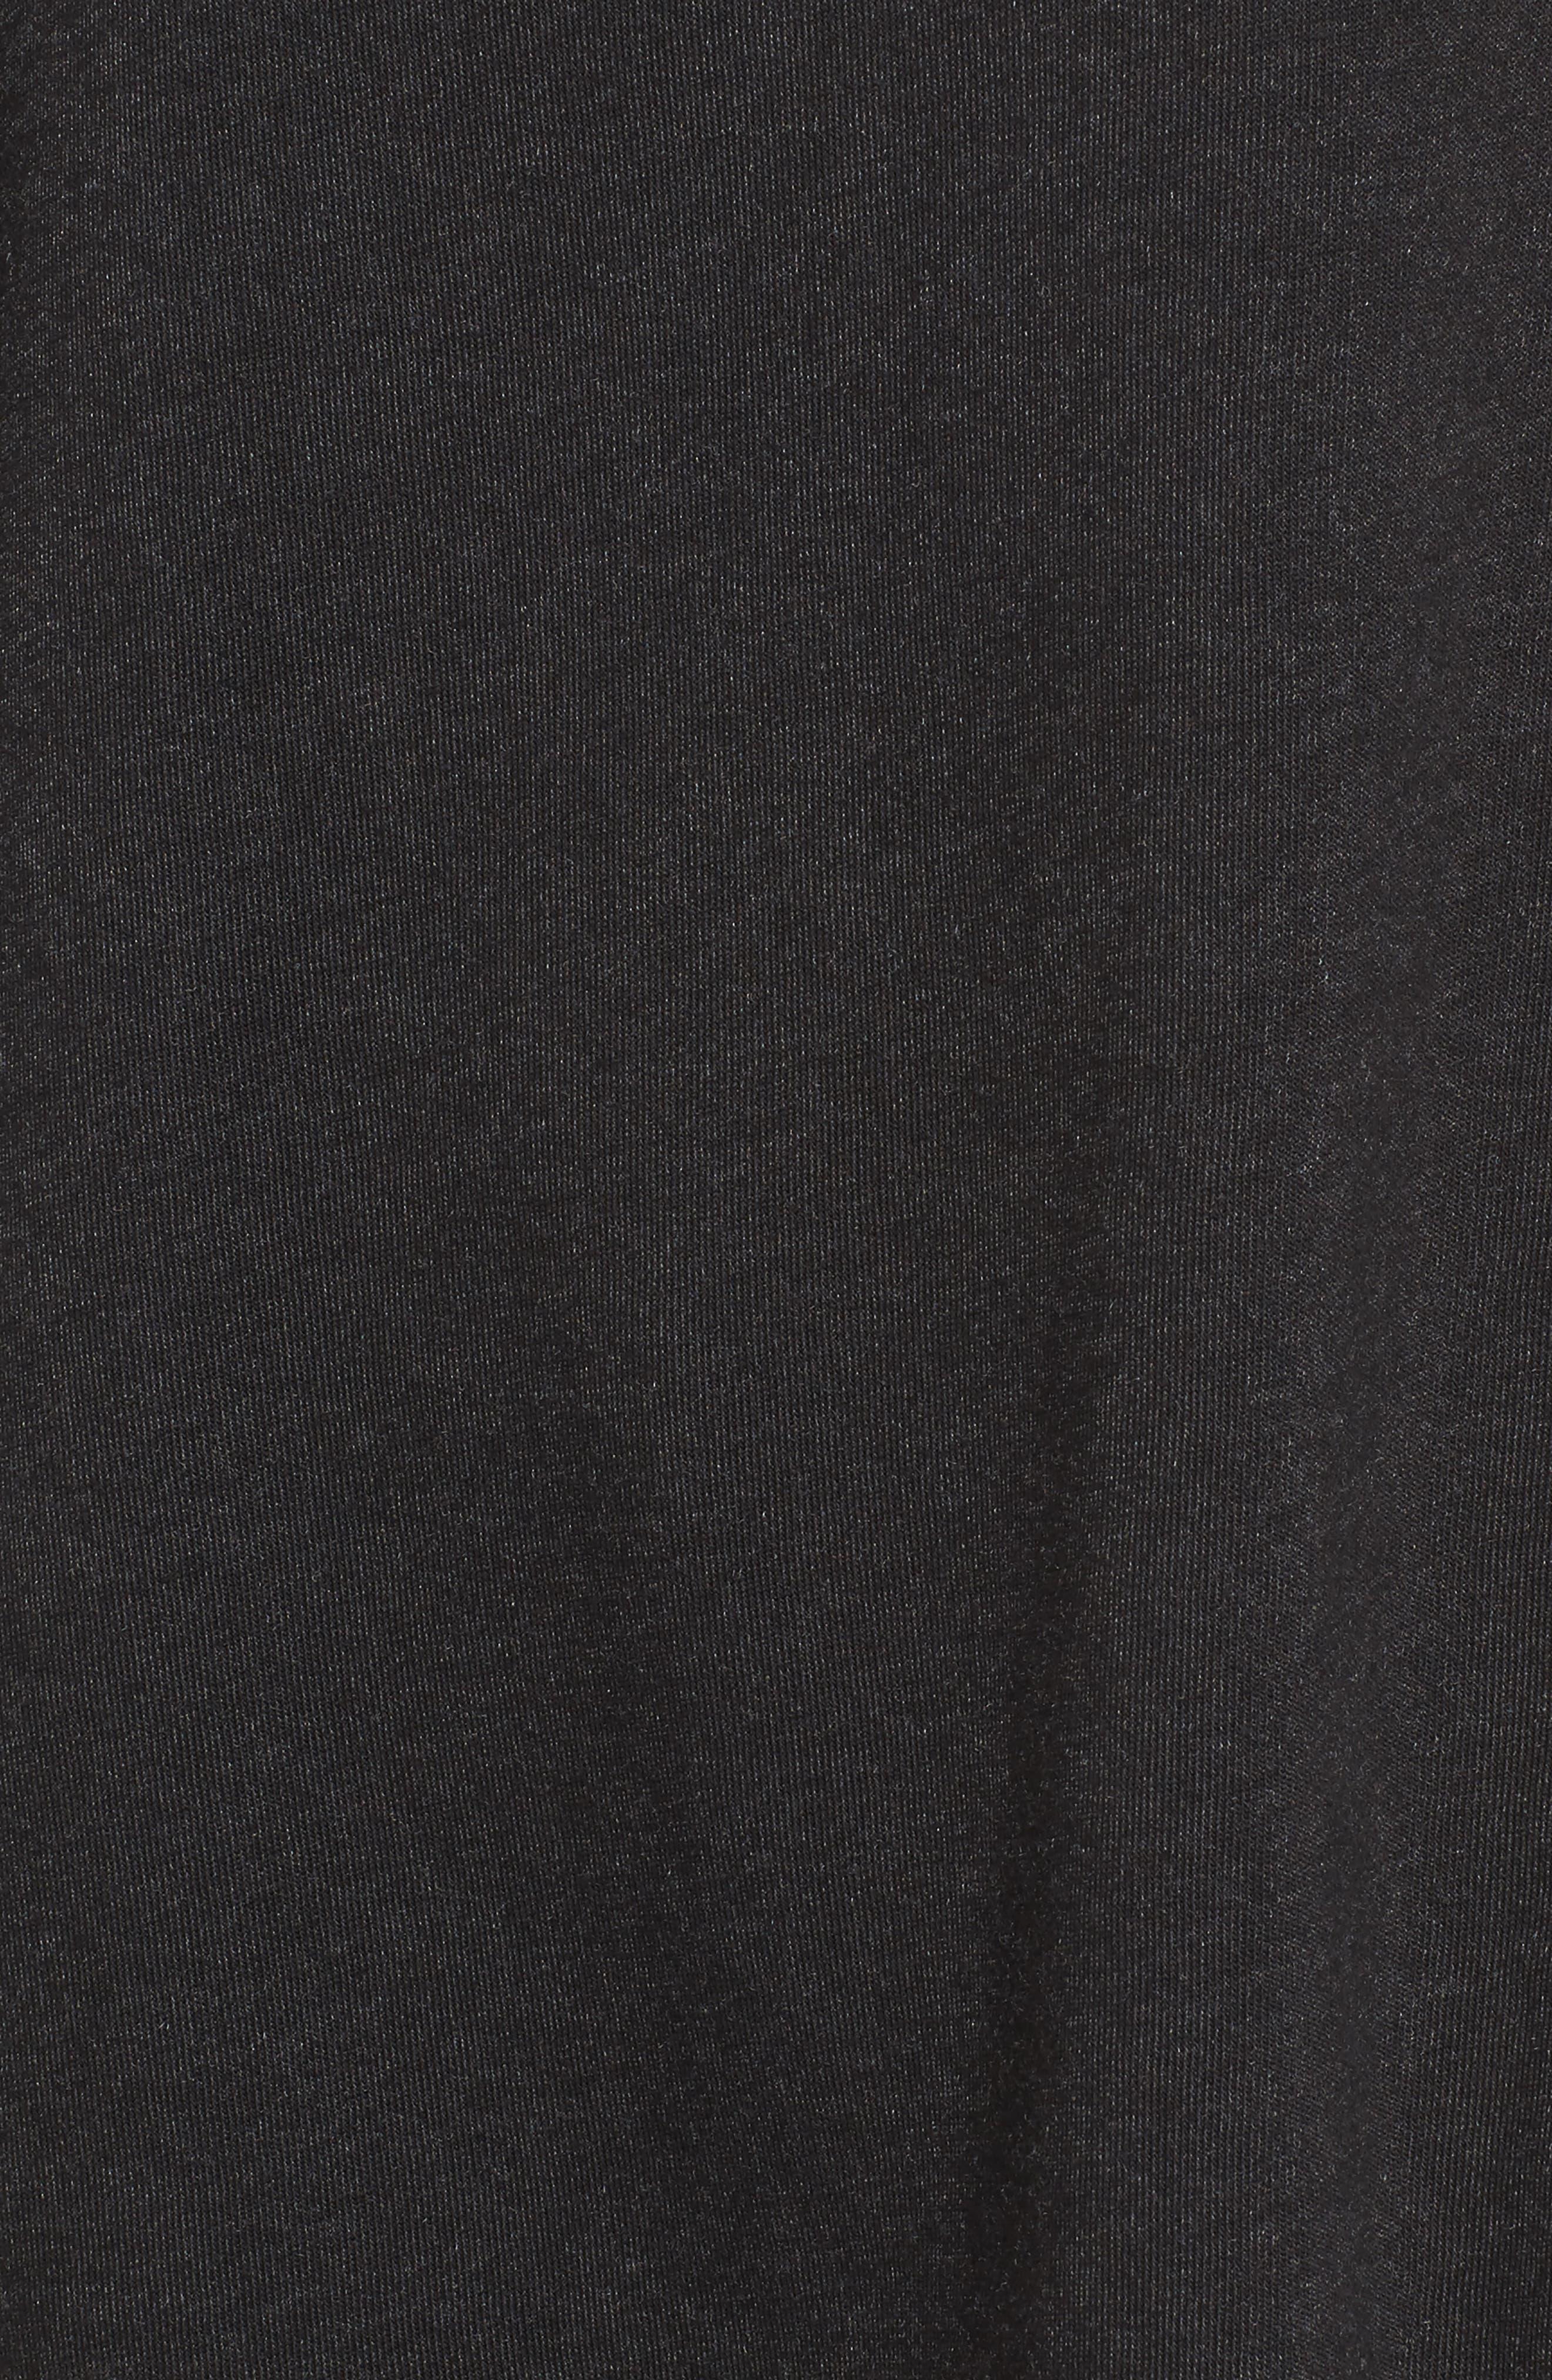 Wicked Sweatshirt,                             Alternate thumbnail 5, color,                             001